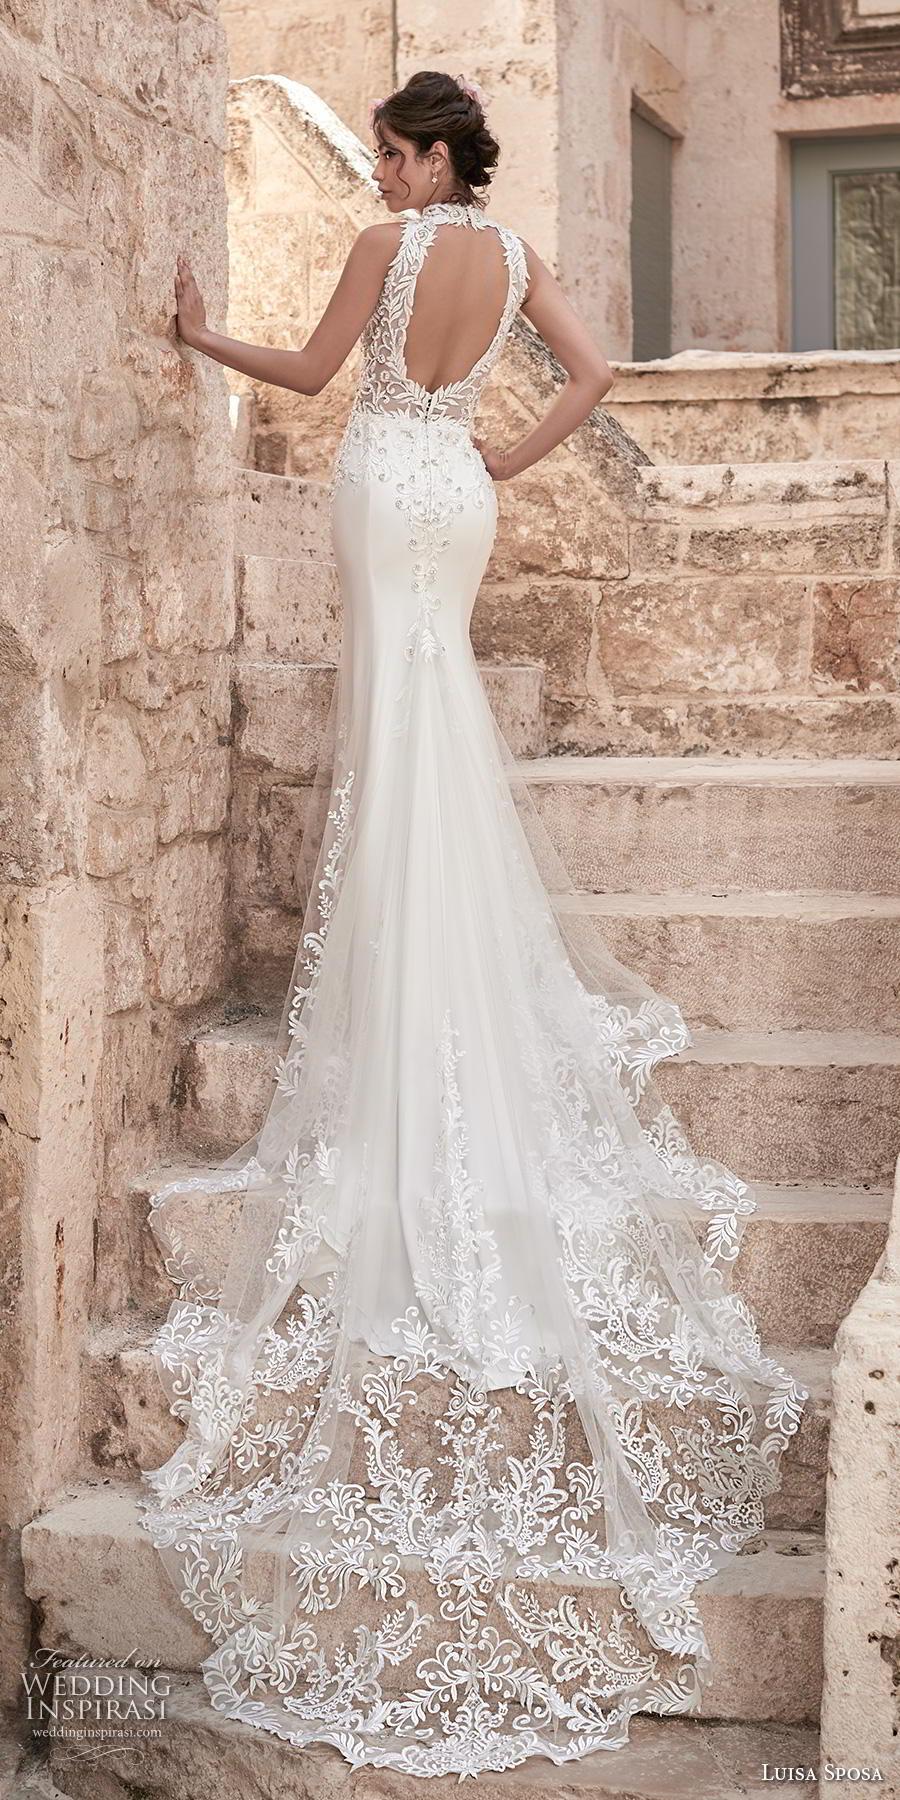 luisa sposa 2020 bridal sleeveless halter neck illusion v neck heavily embellished bodice slit skirt elegant sexy fit and flare wedding dress chapel train (2) bv